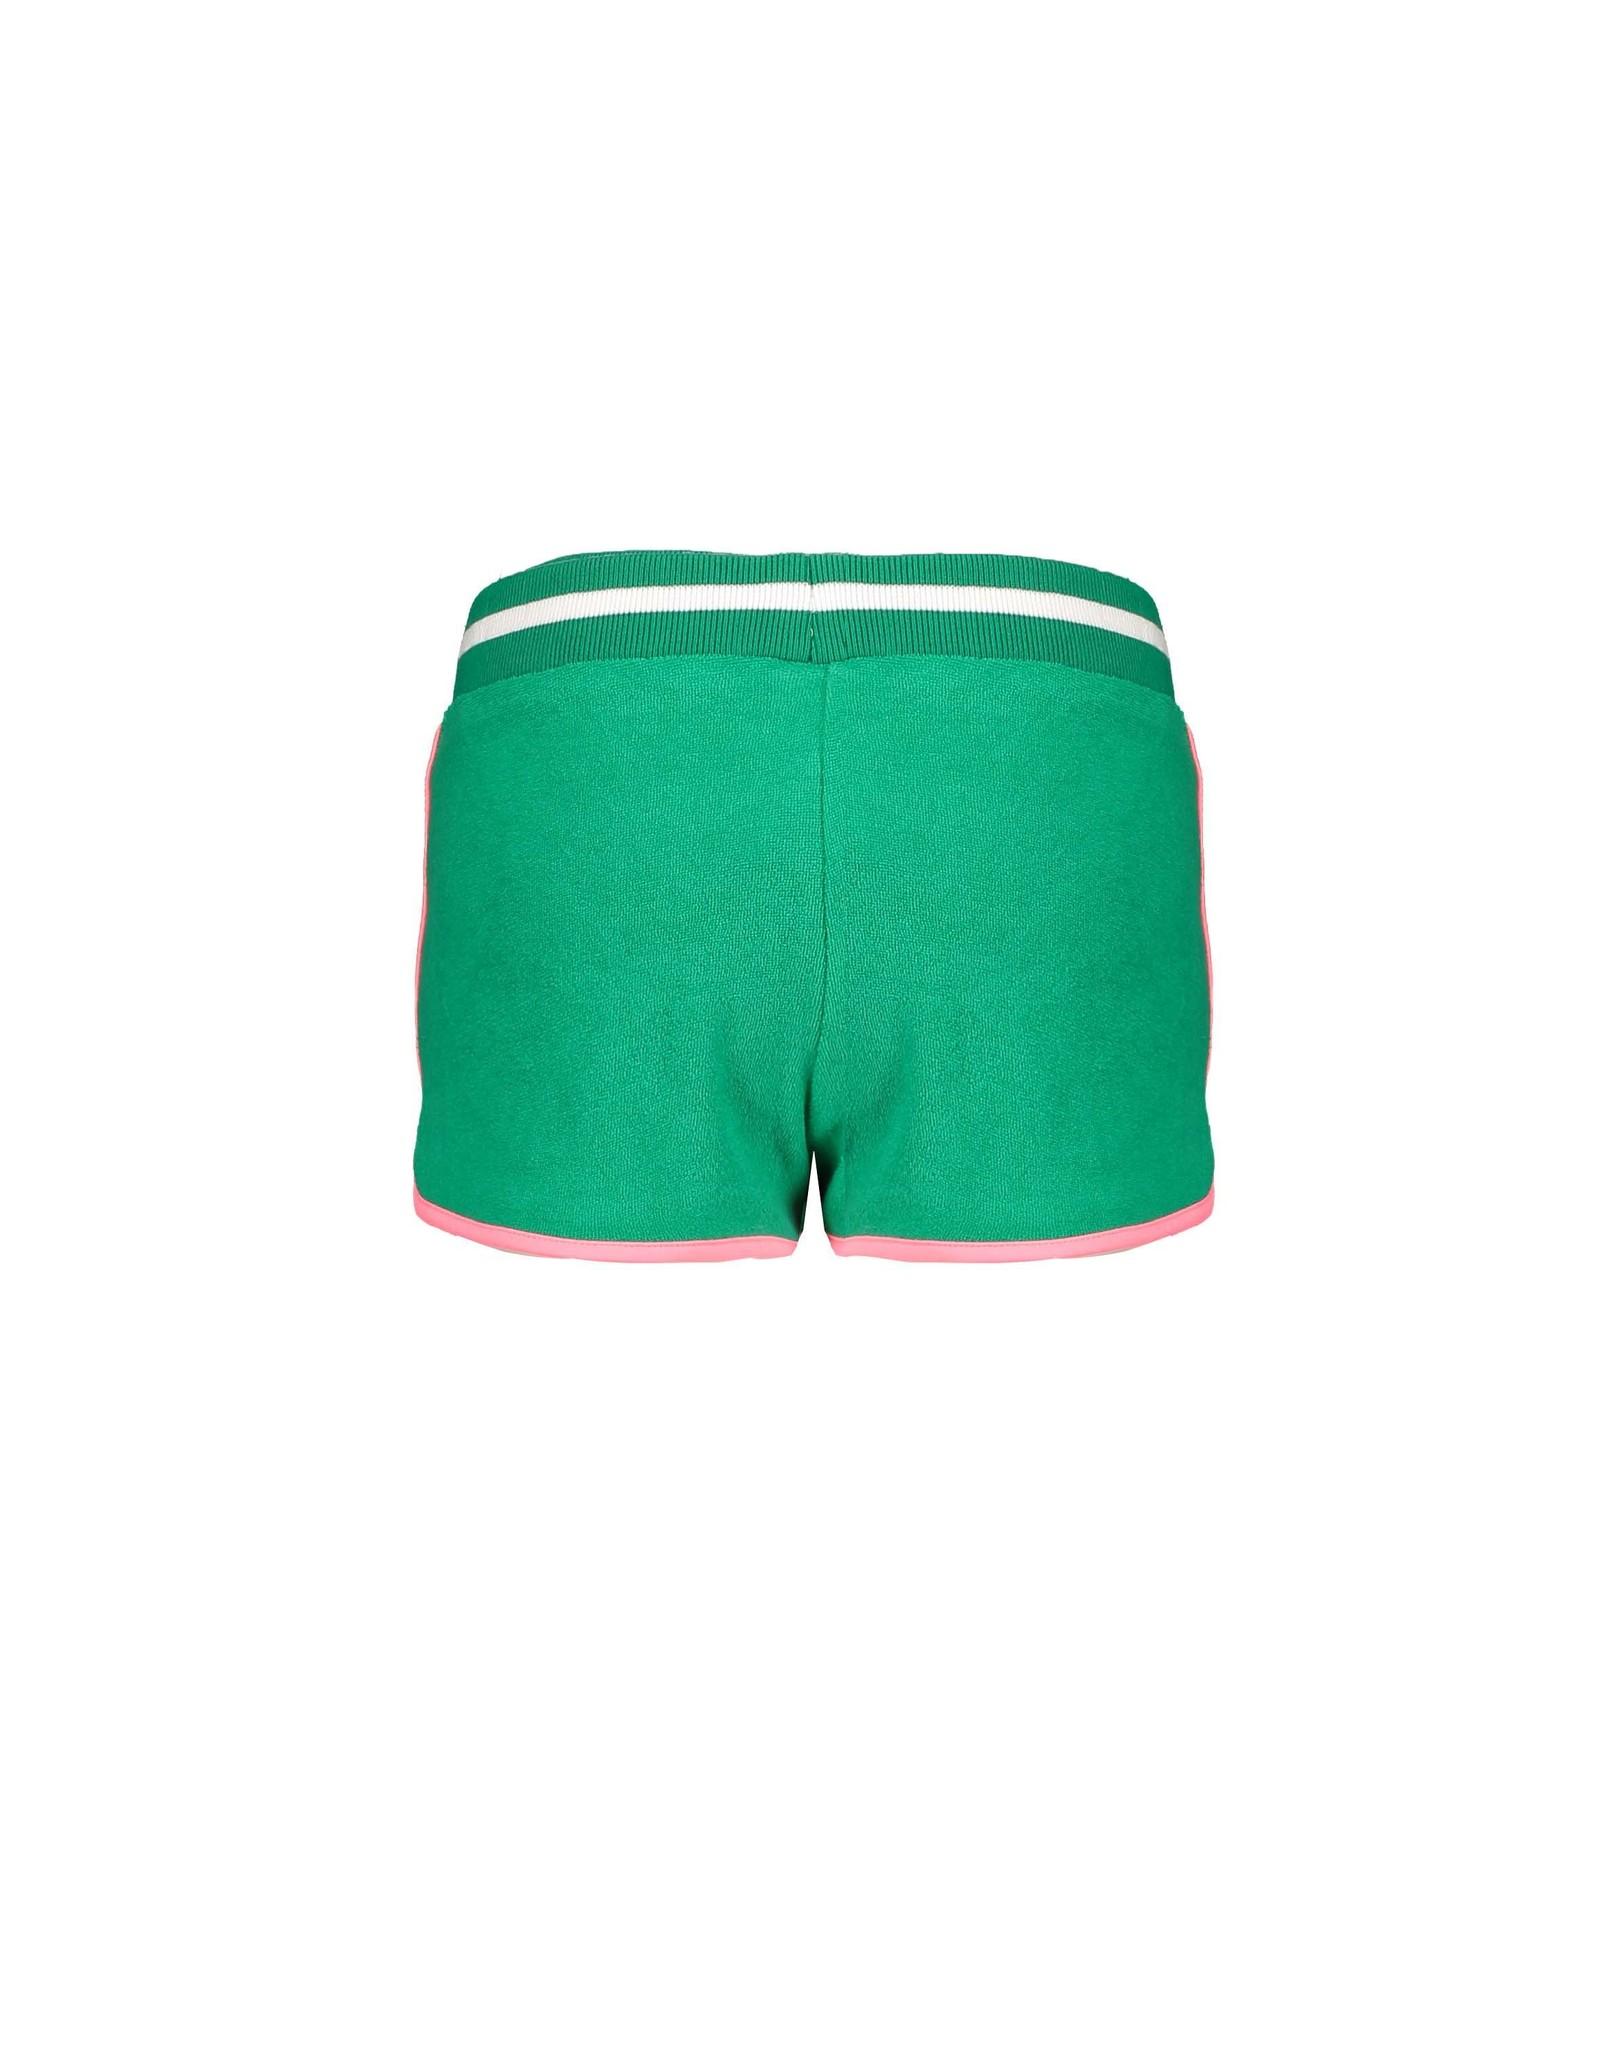 B.Nosy B.Nosy Girls Beach Towel Shorty with contrast Binding  JADE GREEN